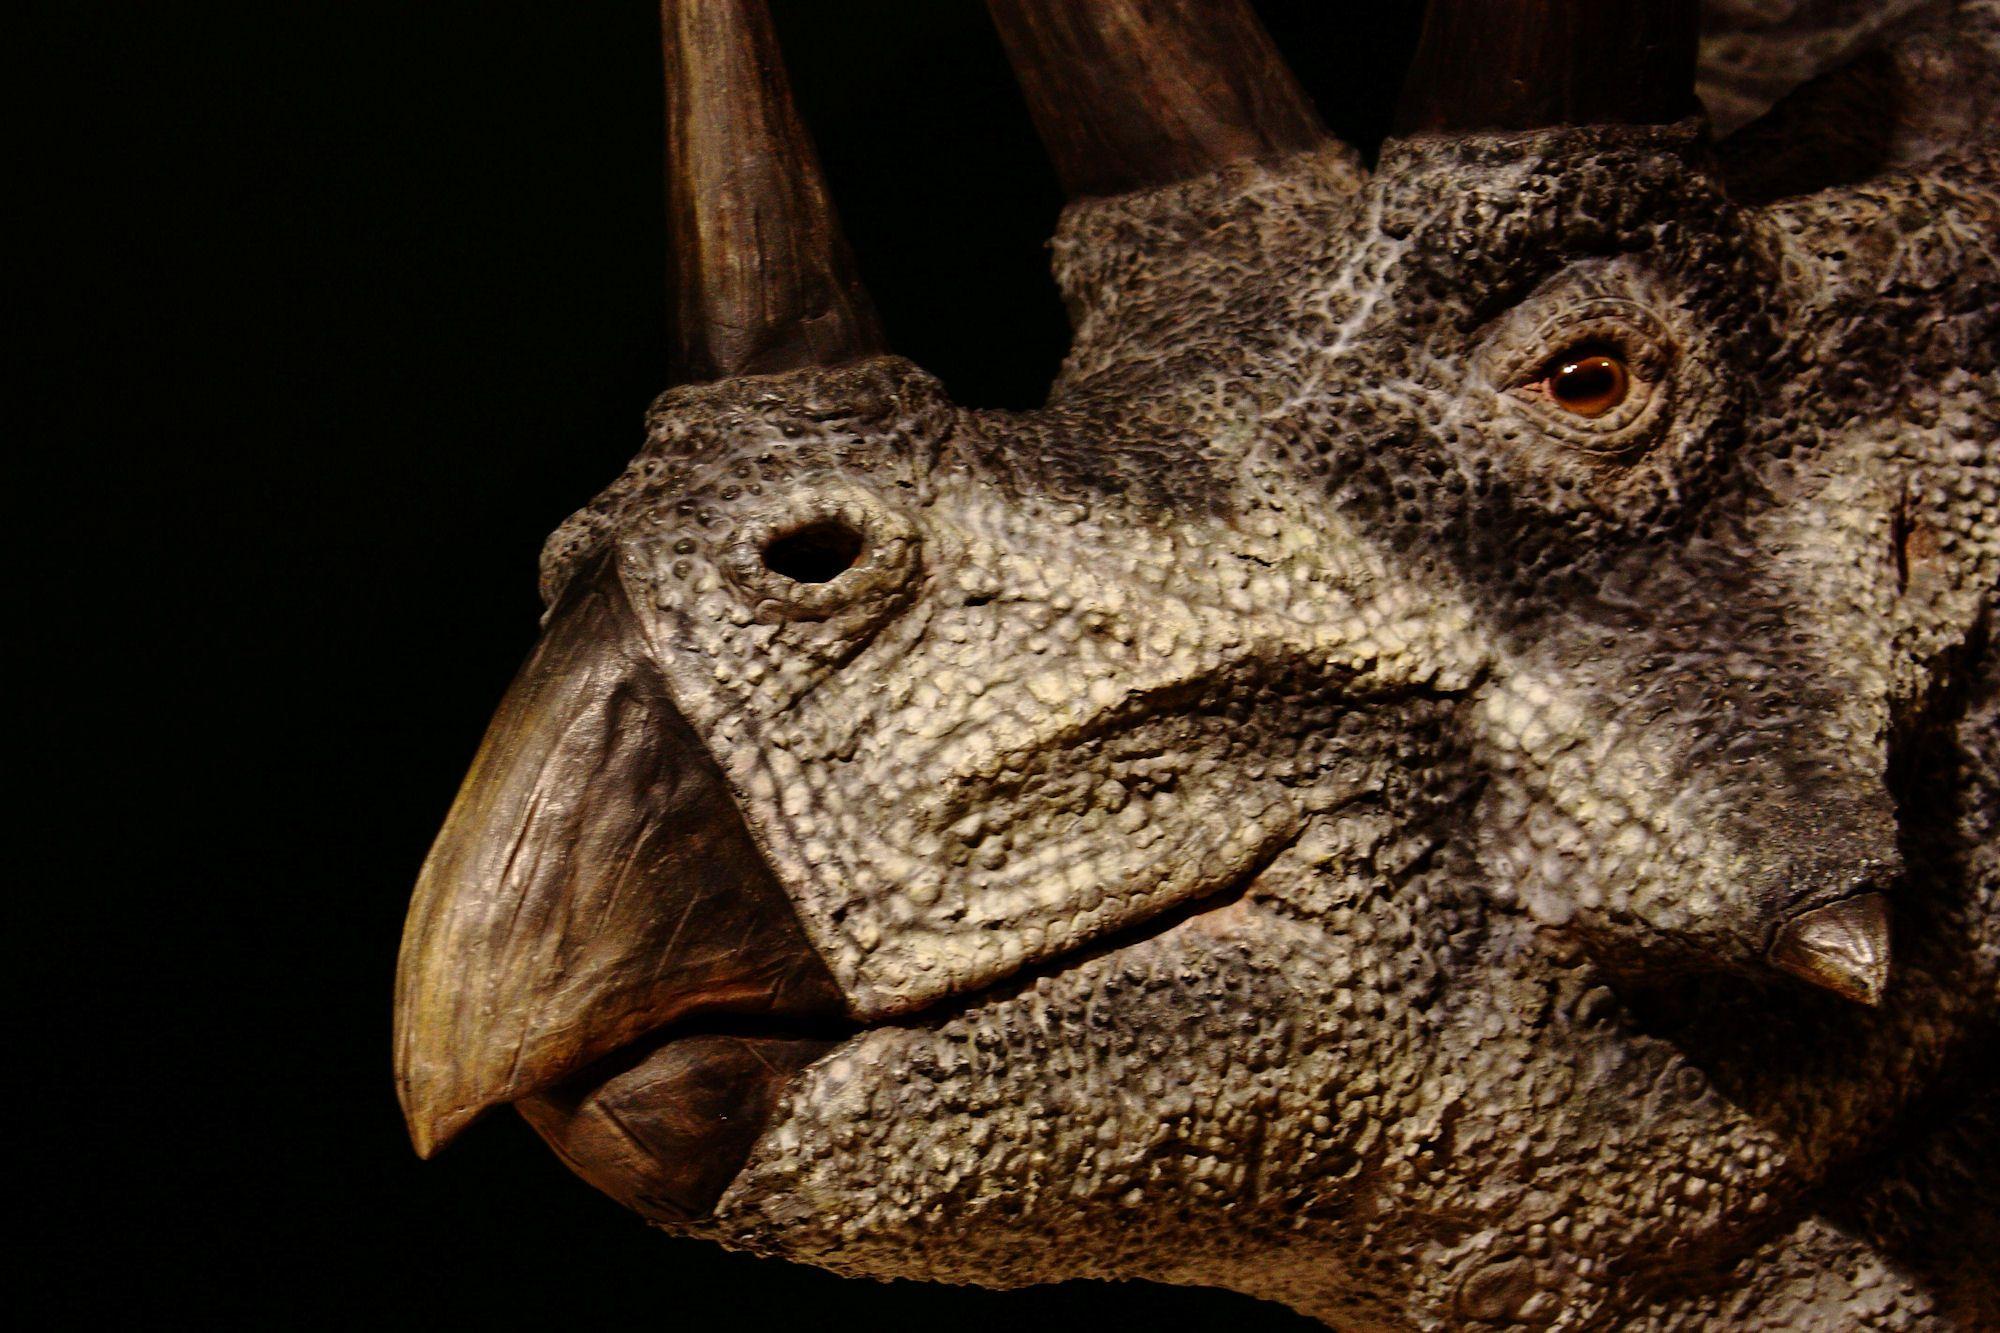 10 Awesome Dinosaur Wallpaper Designs Dinosaur wallpaper